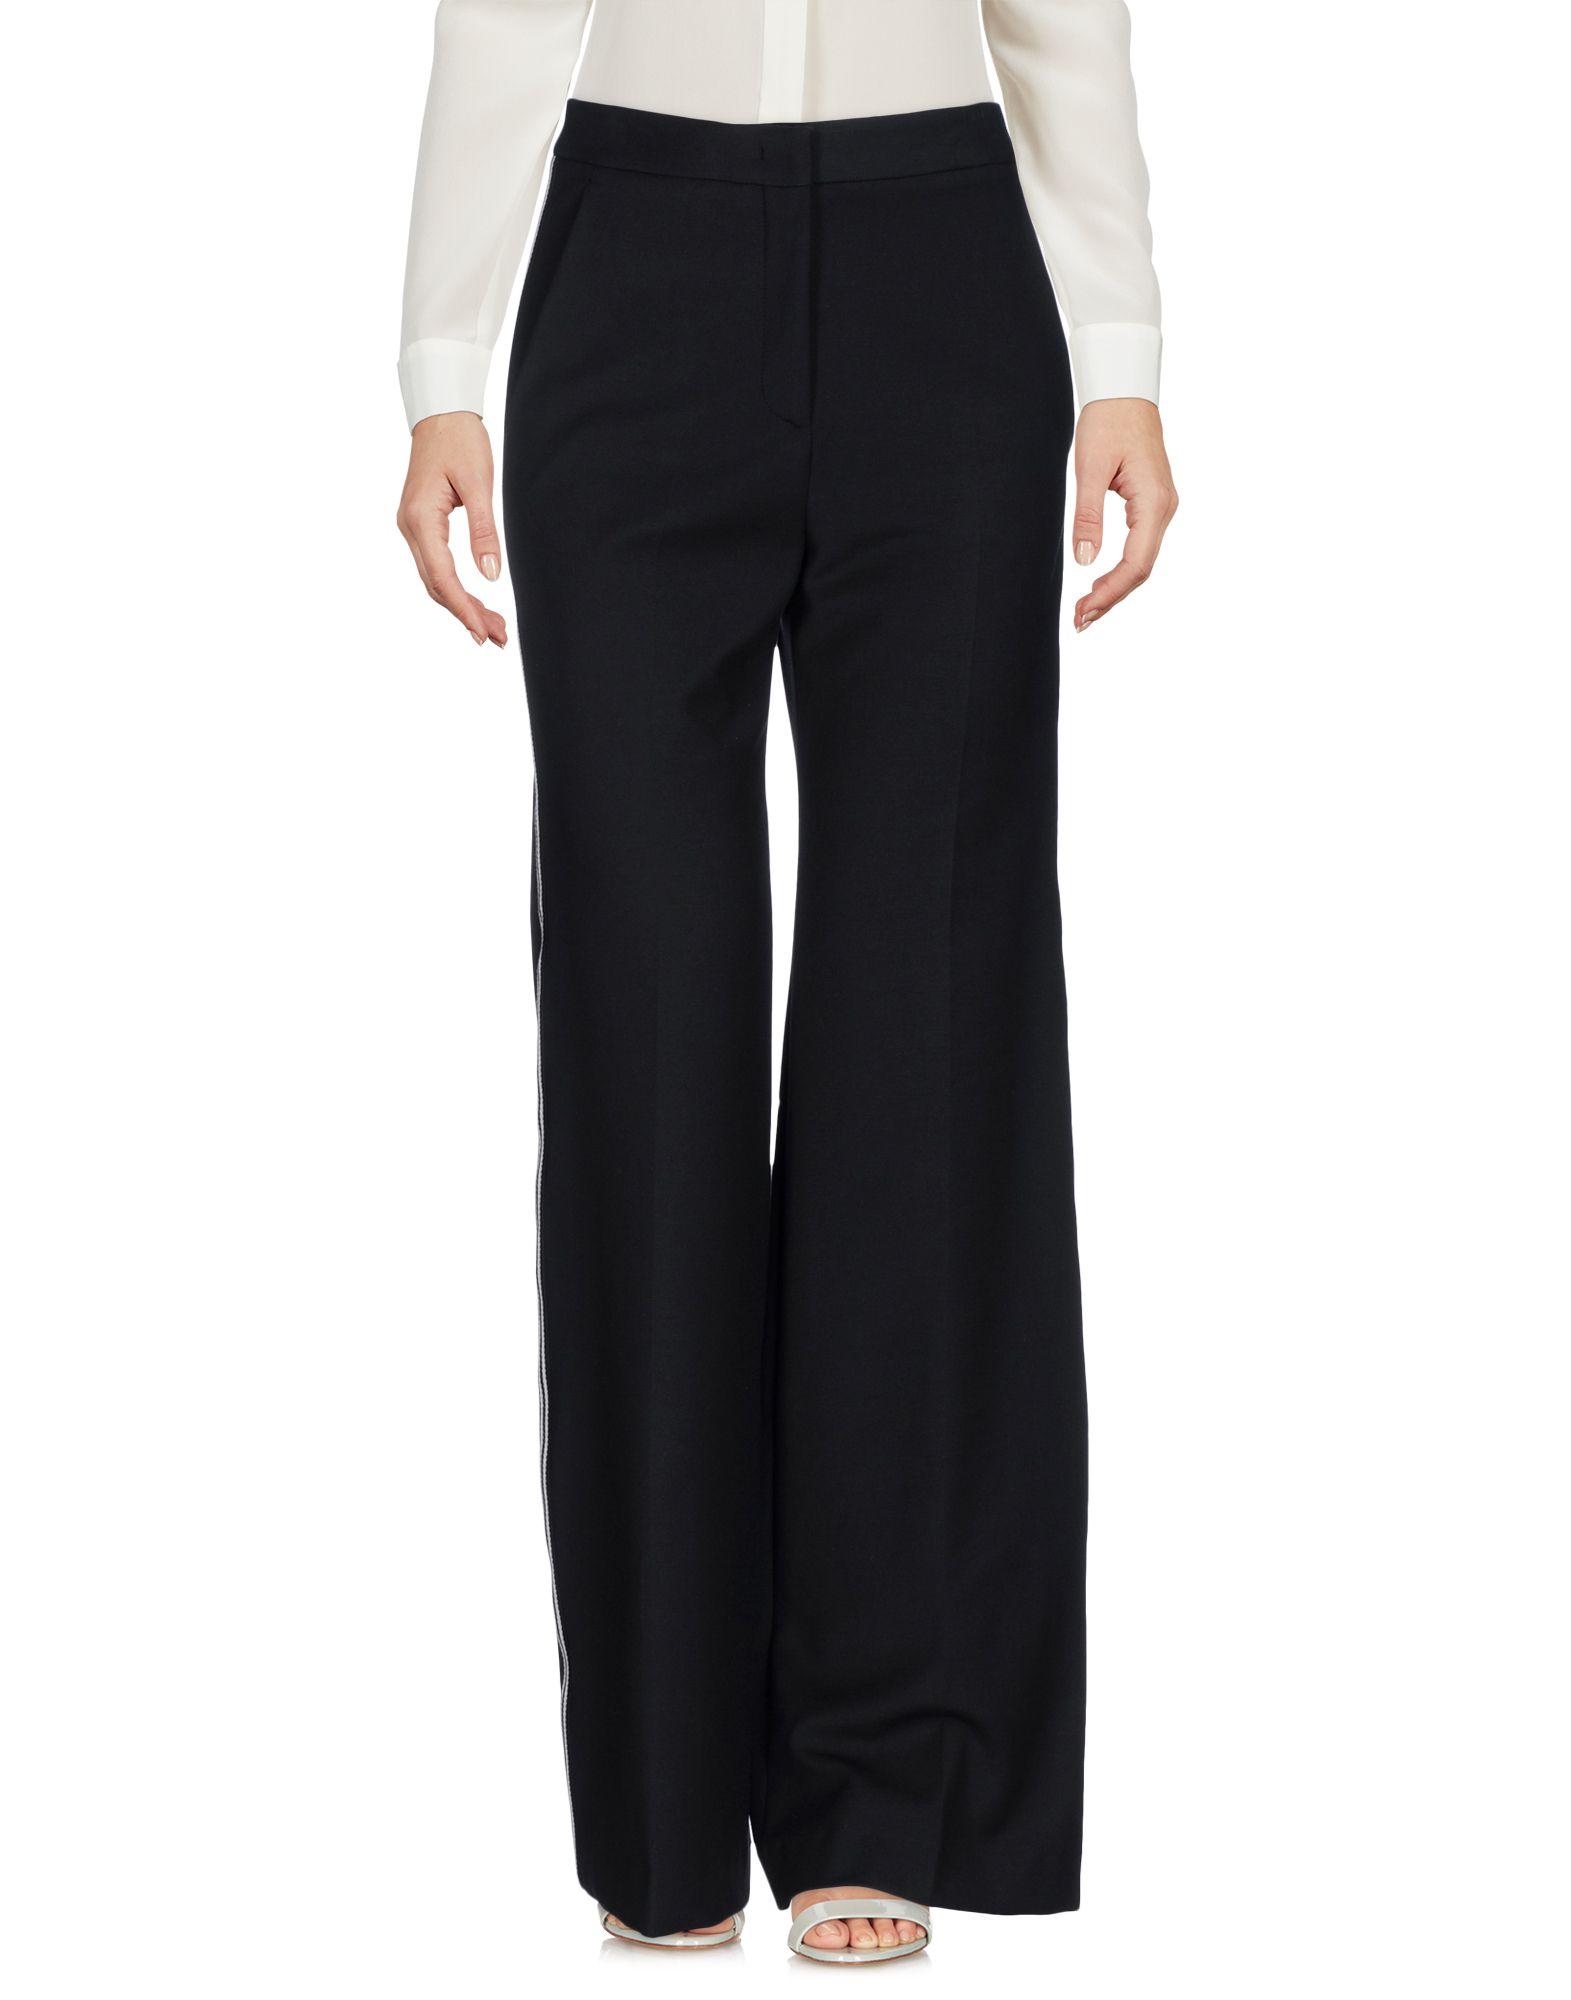 Pantalone Cm.100 Donna - Acquista online su eTAK2azlLg